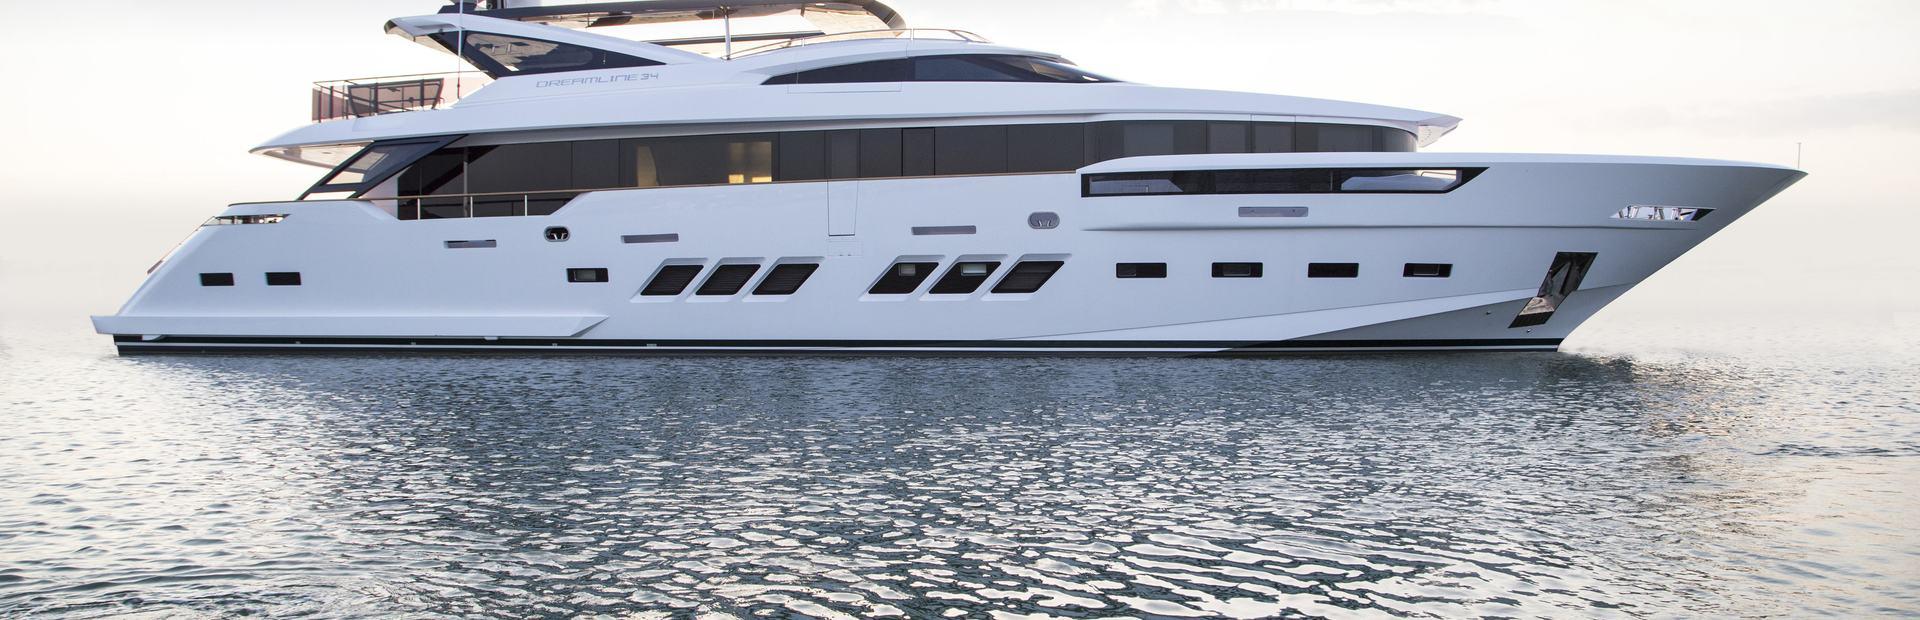 Dreamline 34 Yacht Charter